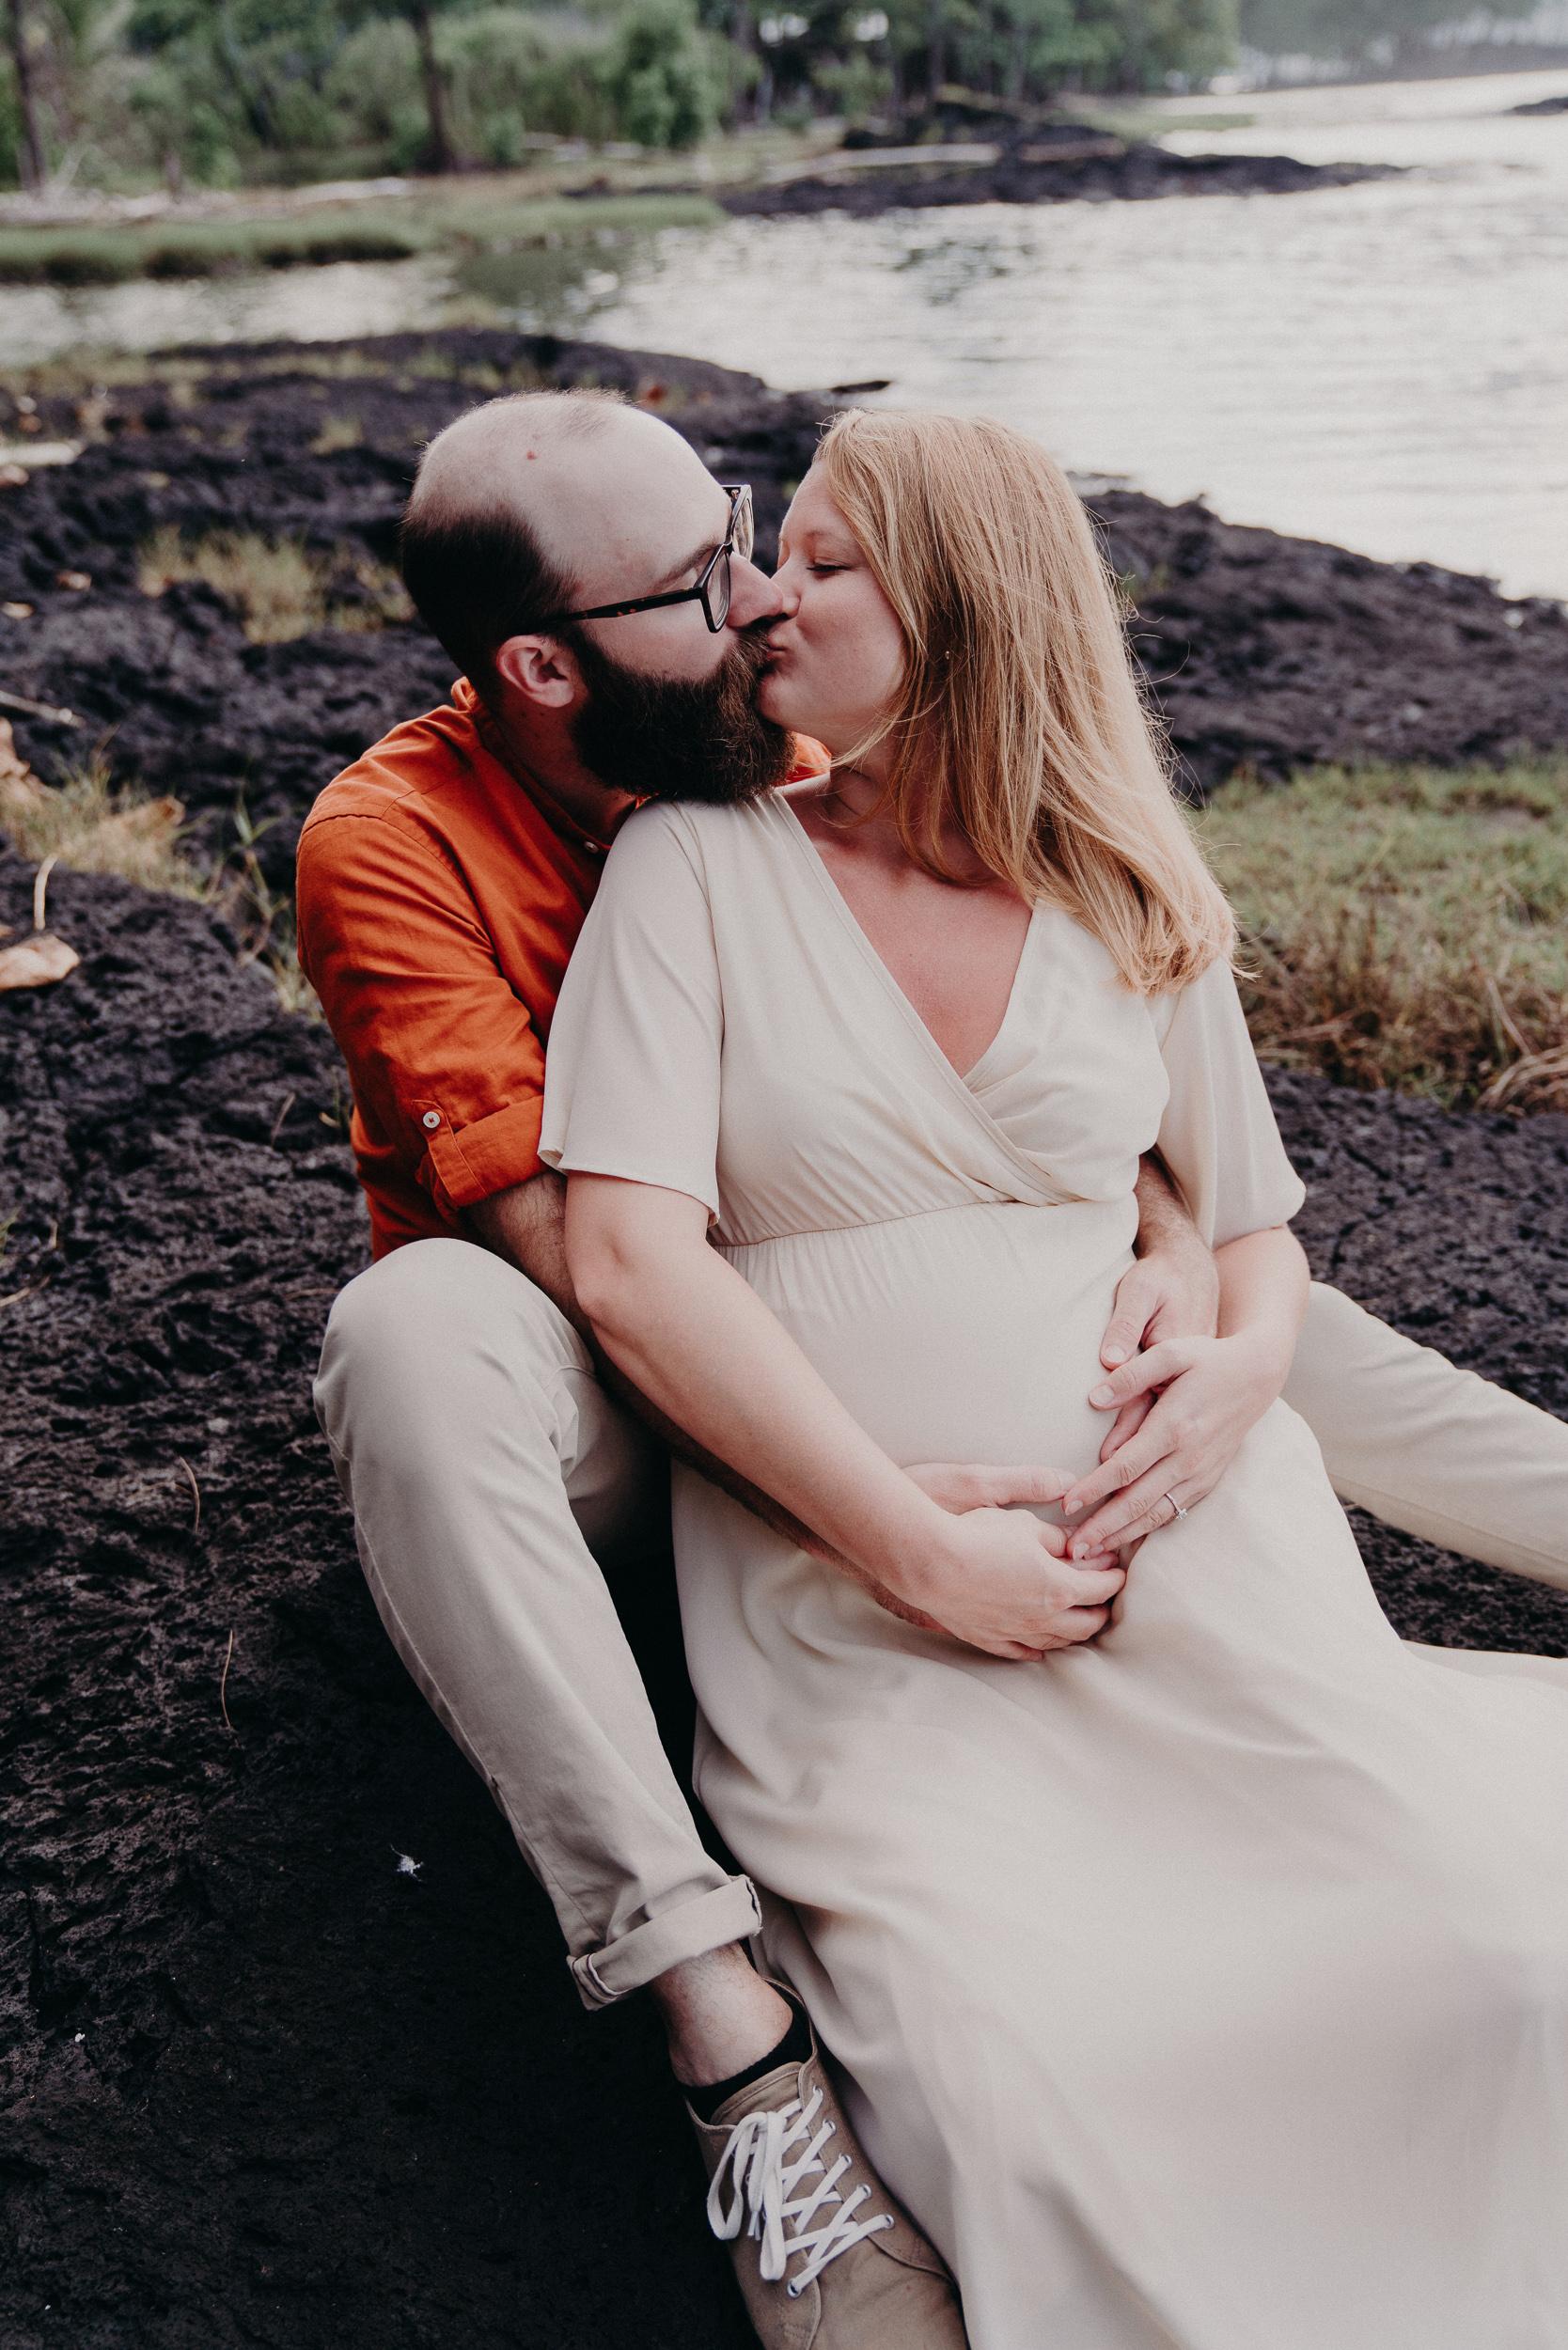 Sonia Primerano Photography Hawaii Hilo Kona Big Island Weddings Elopements Maternity Portraits Couples Adventure